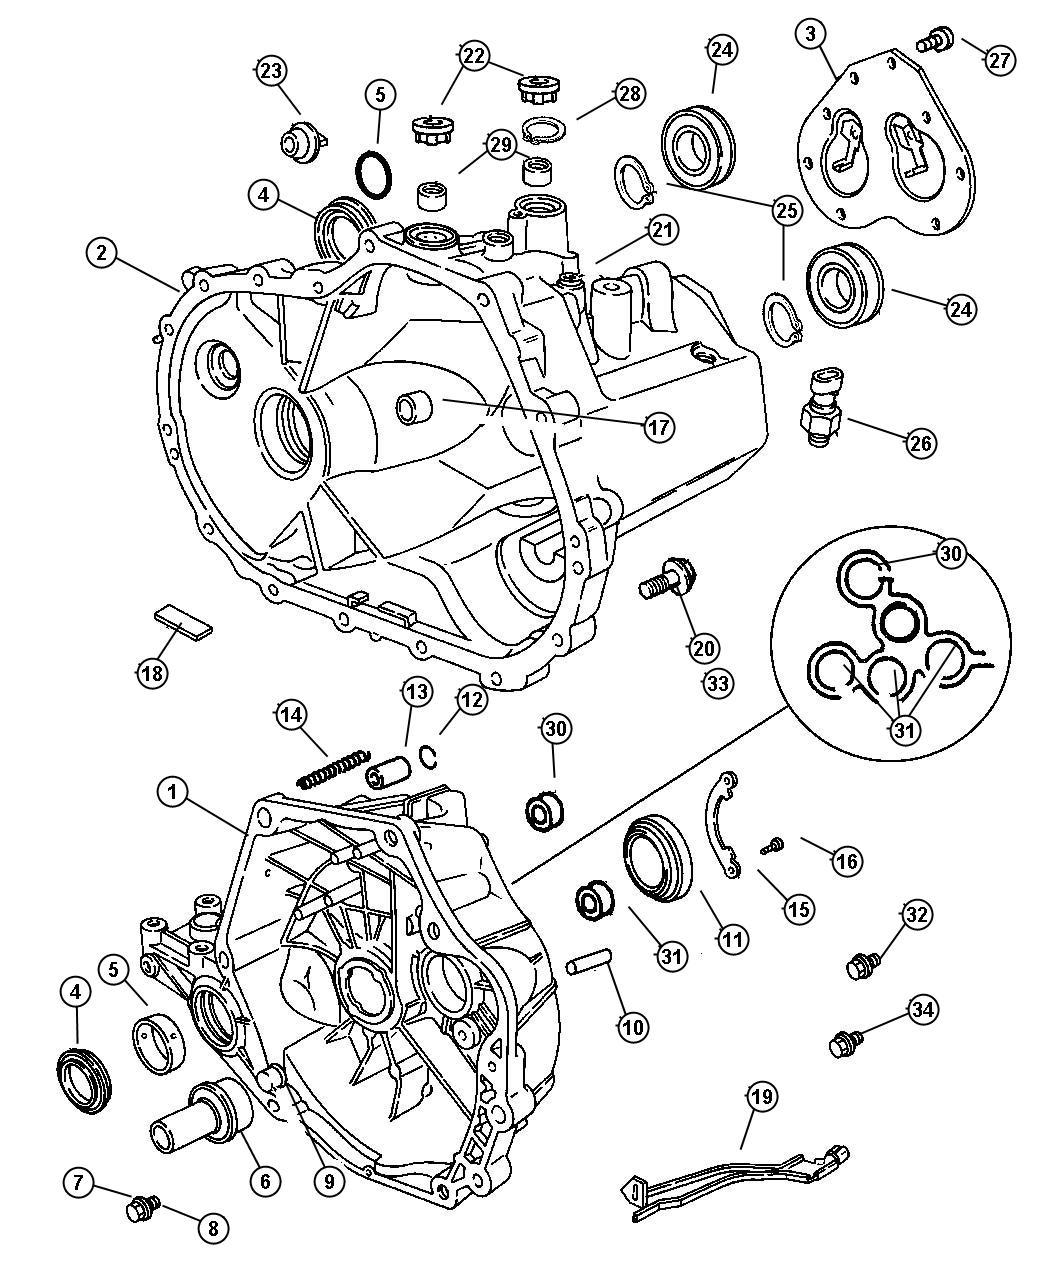 Chrysler Pt Cruiser Case Transaxle Amp Related Parts